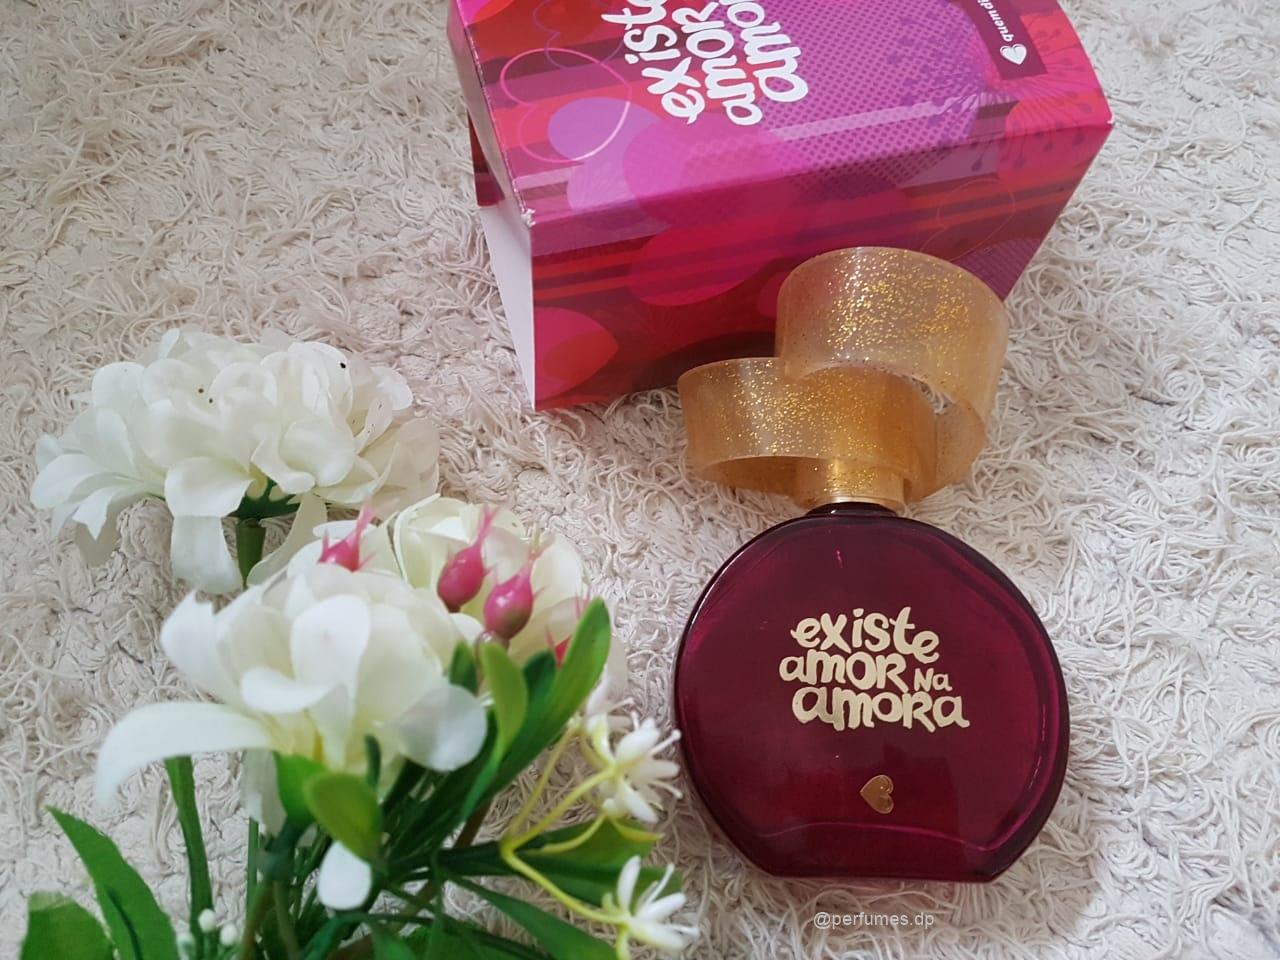 Resenha Perfume Existe amor na amora